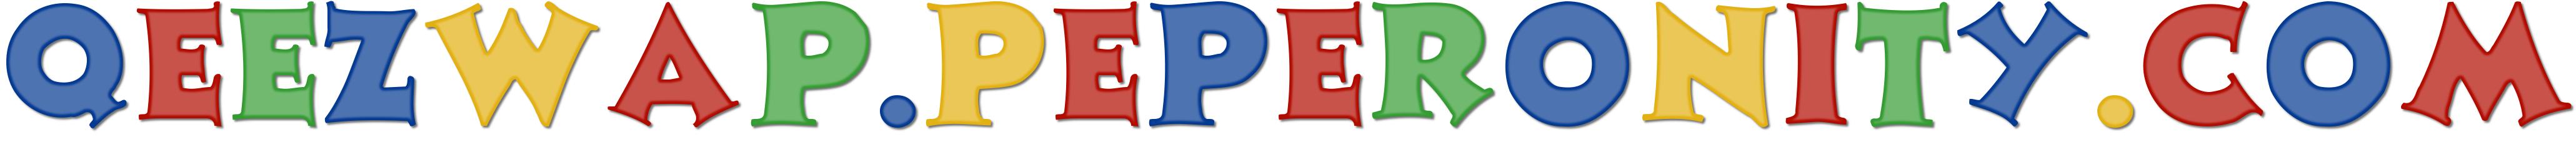 QEEZWAP.PEPERONITY.COM logo. Free logo maker..